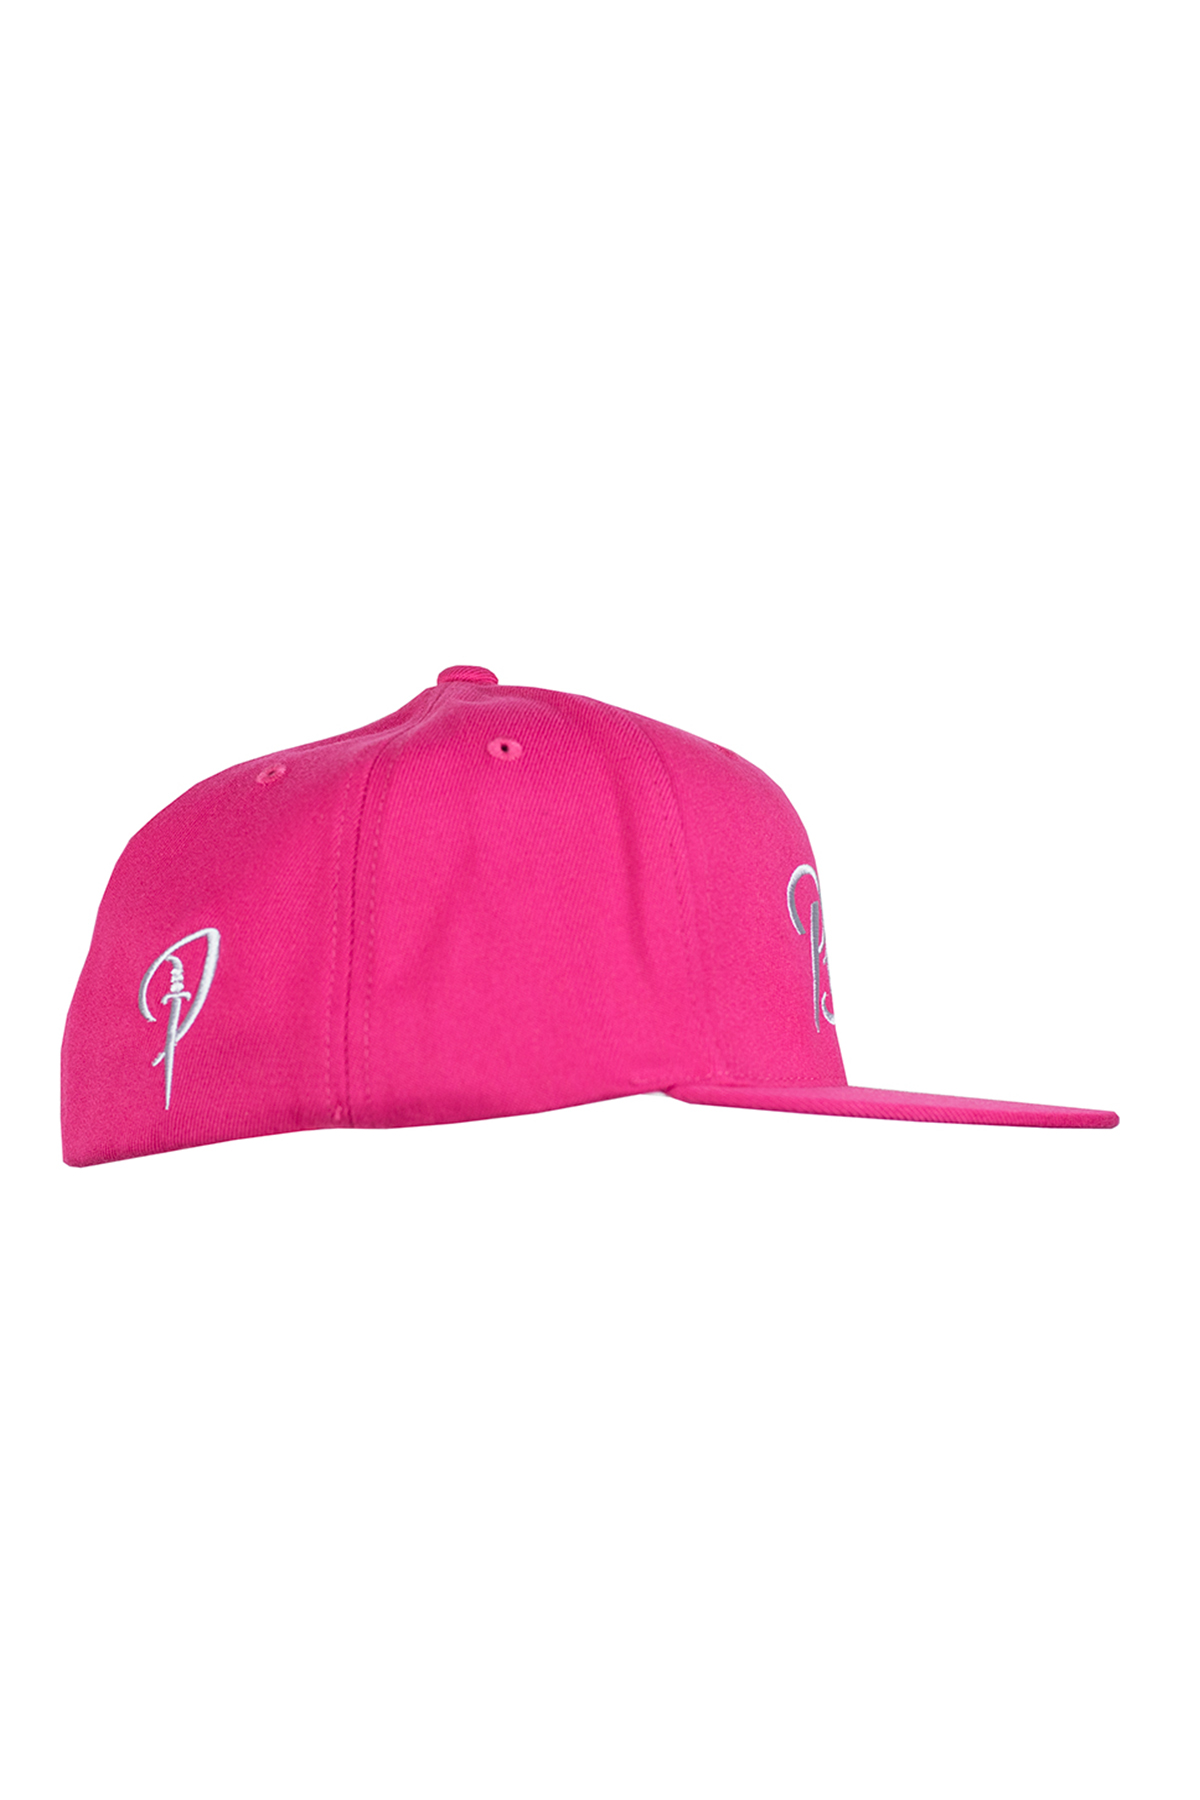 "7cad41c99fe52 Home   Ladies   Headgear   Flexfit Cap ""PIRADOS TM"" Pink"